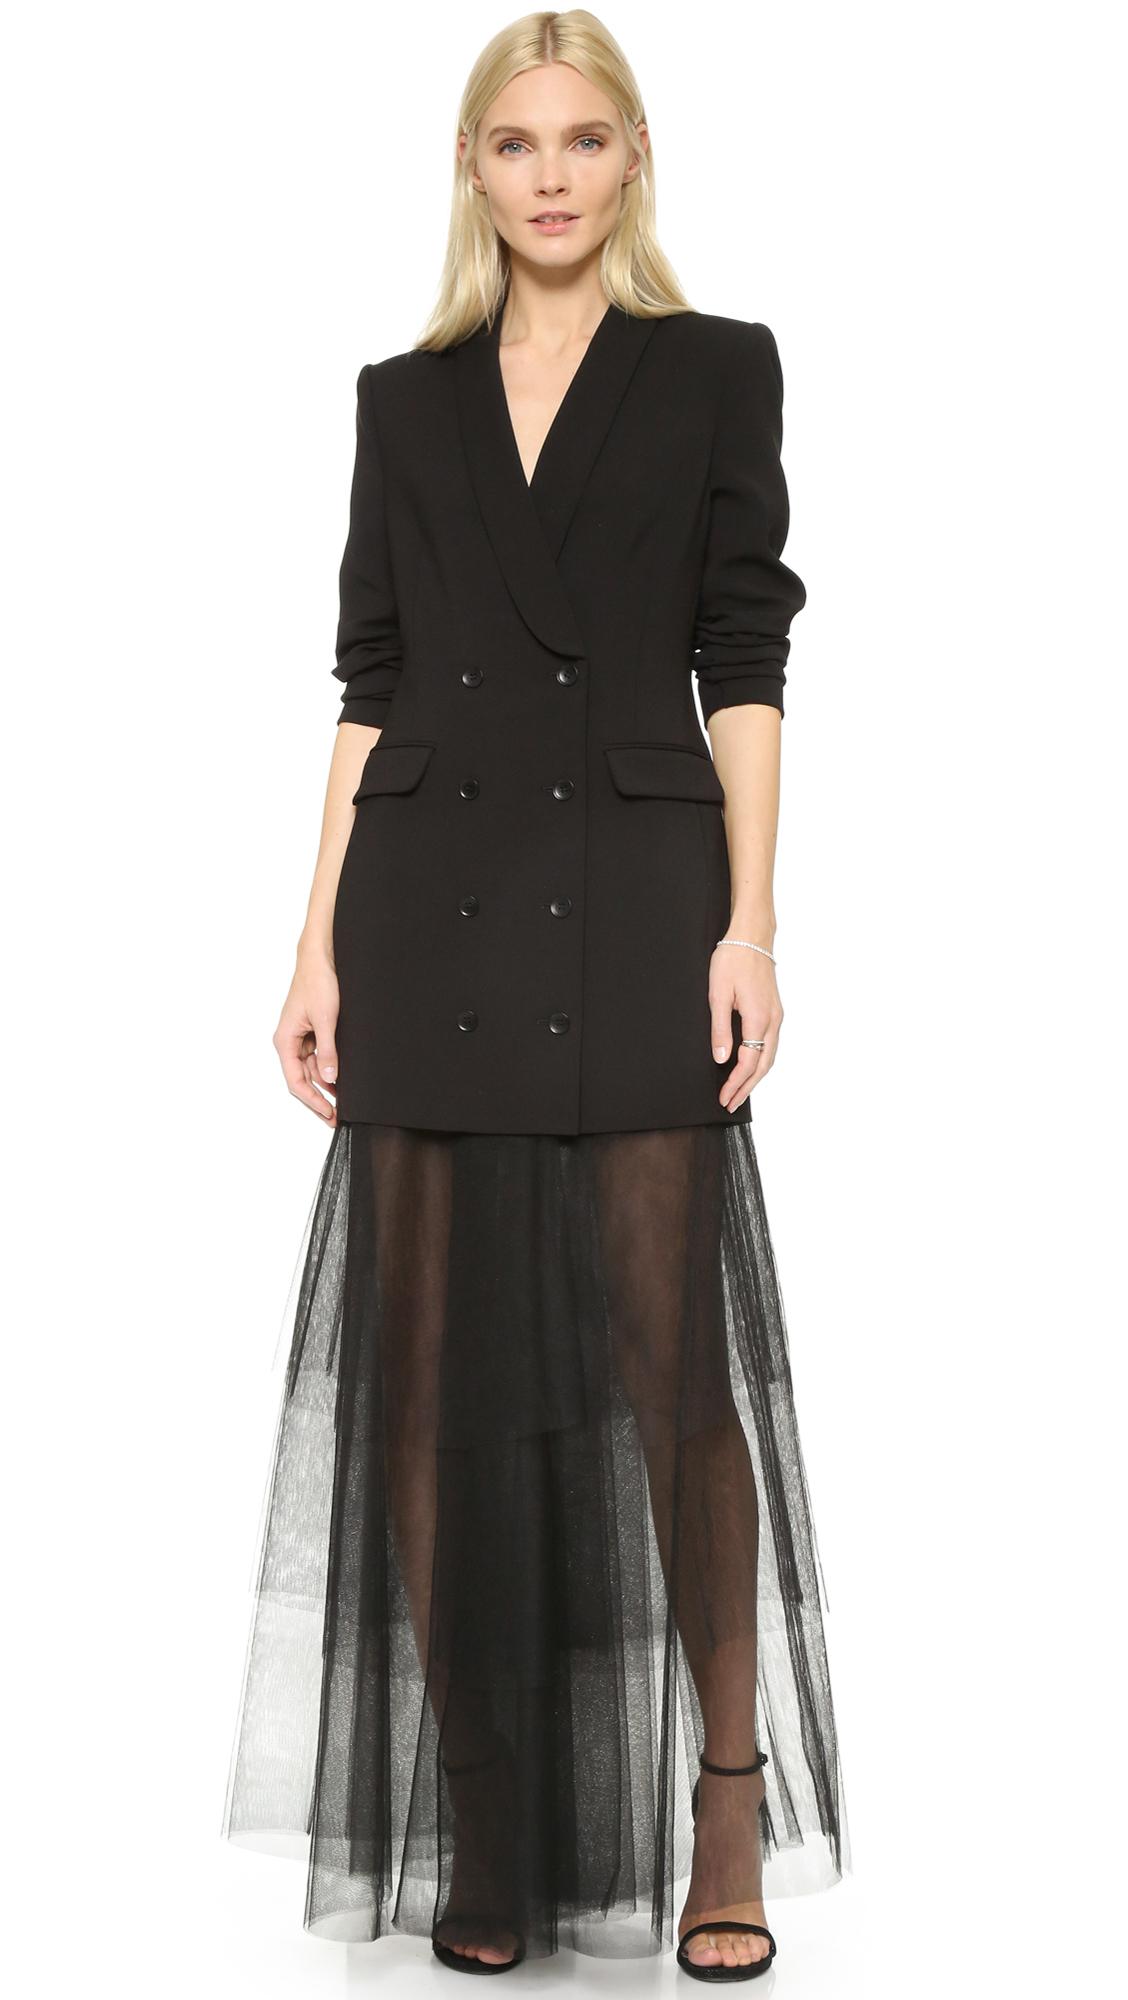 Lyst - Bcbgmaxazria Tux Jacket Gown in Black